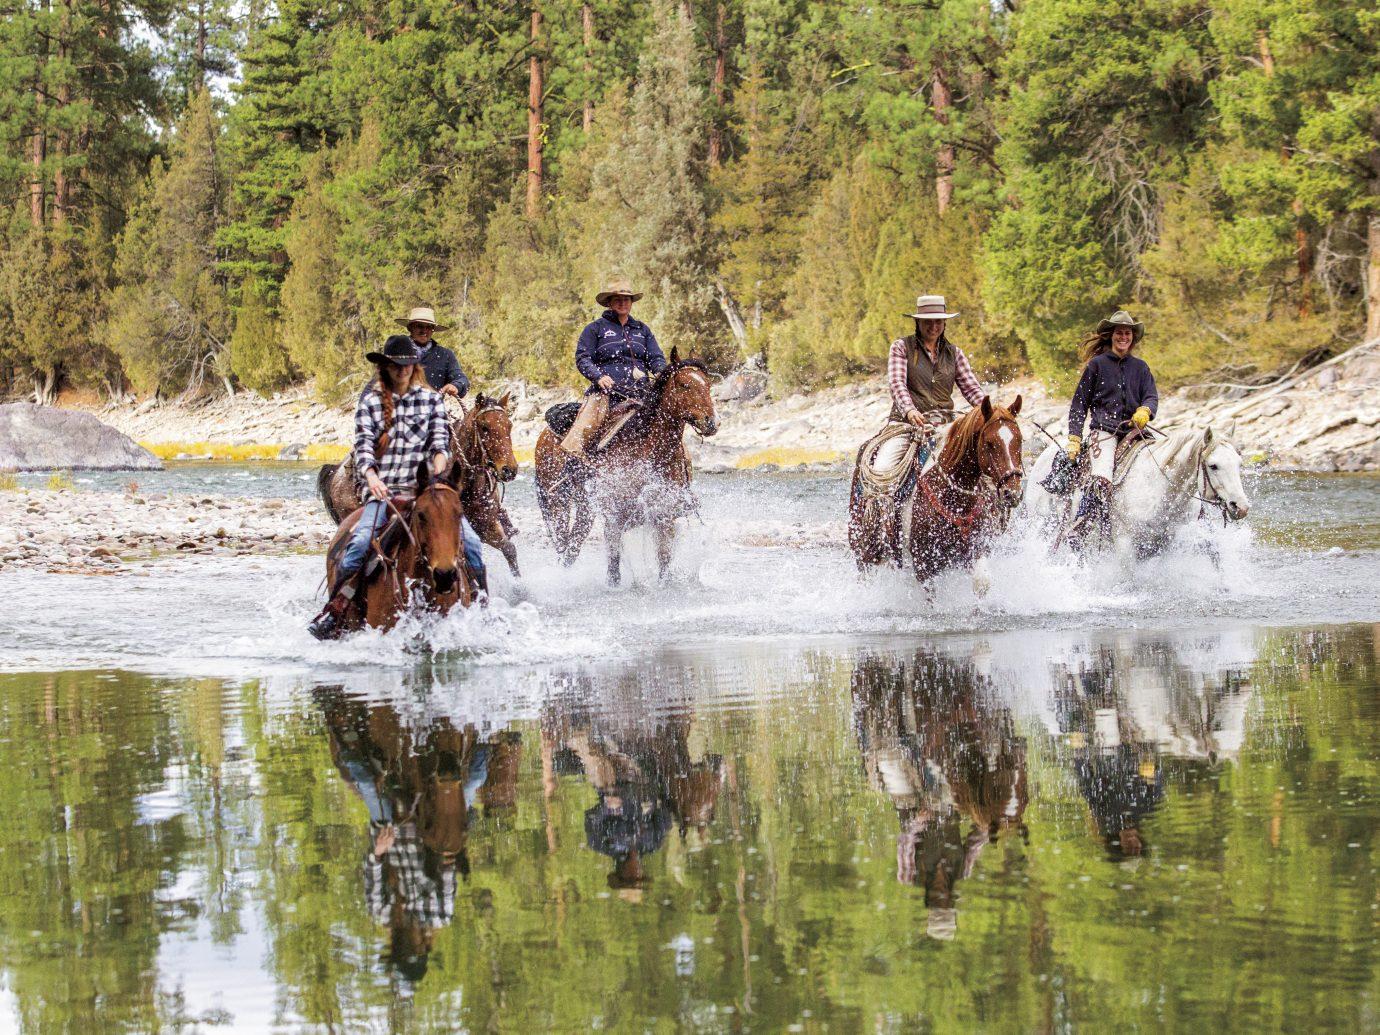 People horseback riding at The Resort at Paws Up, Montana